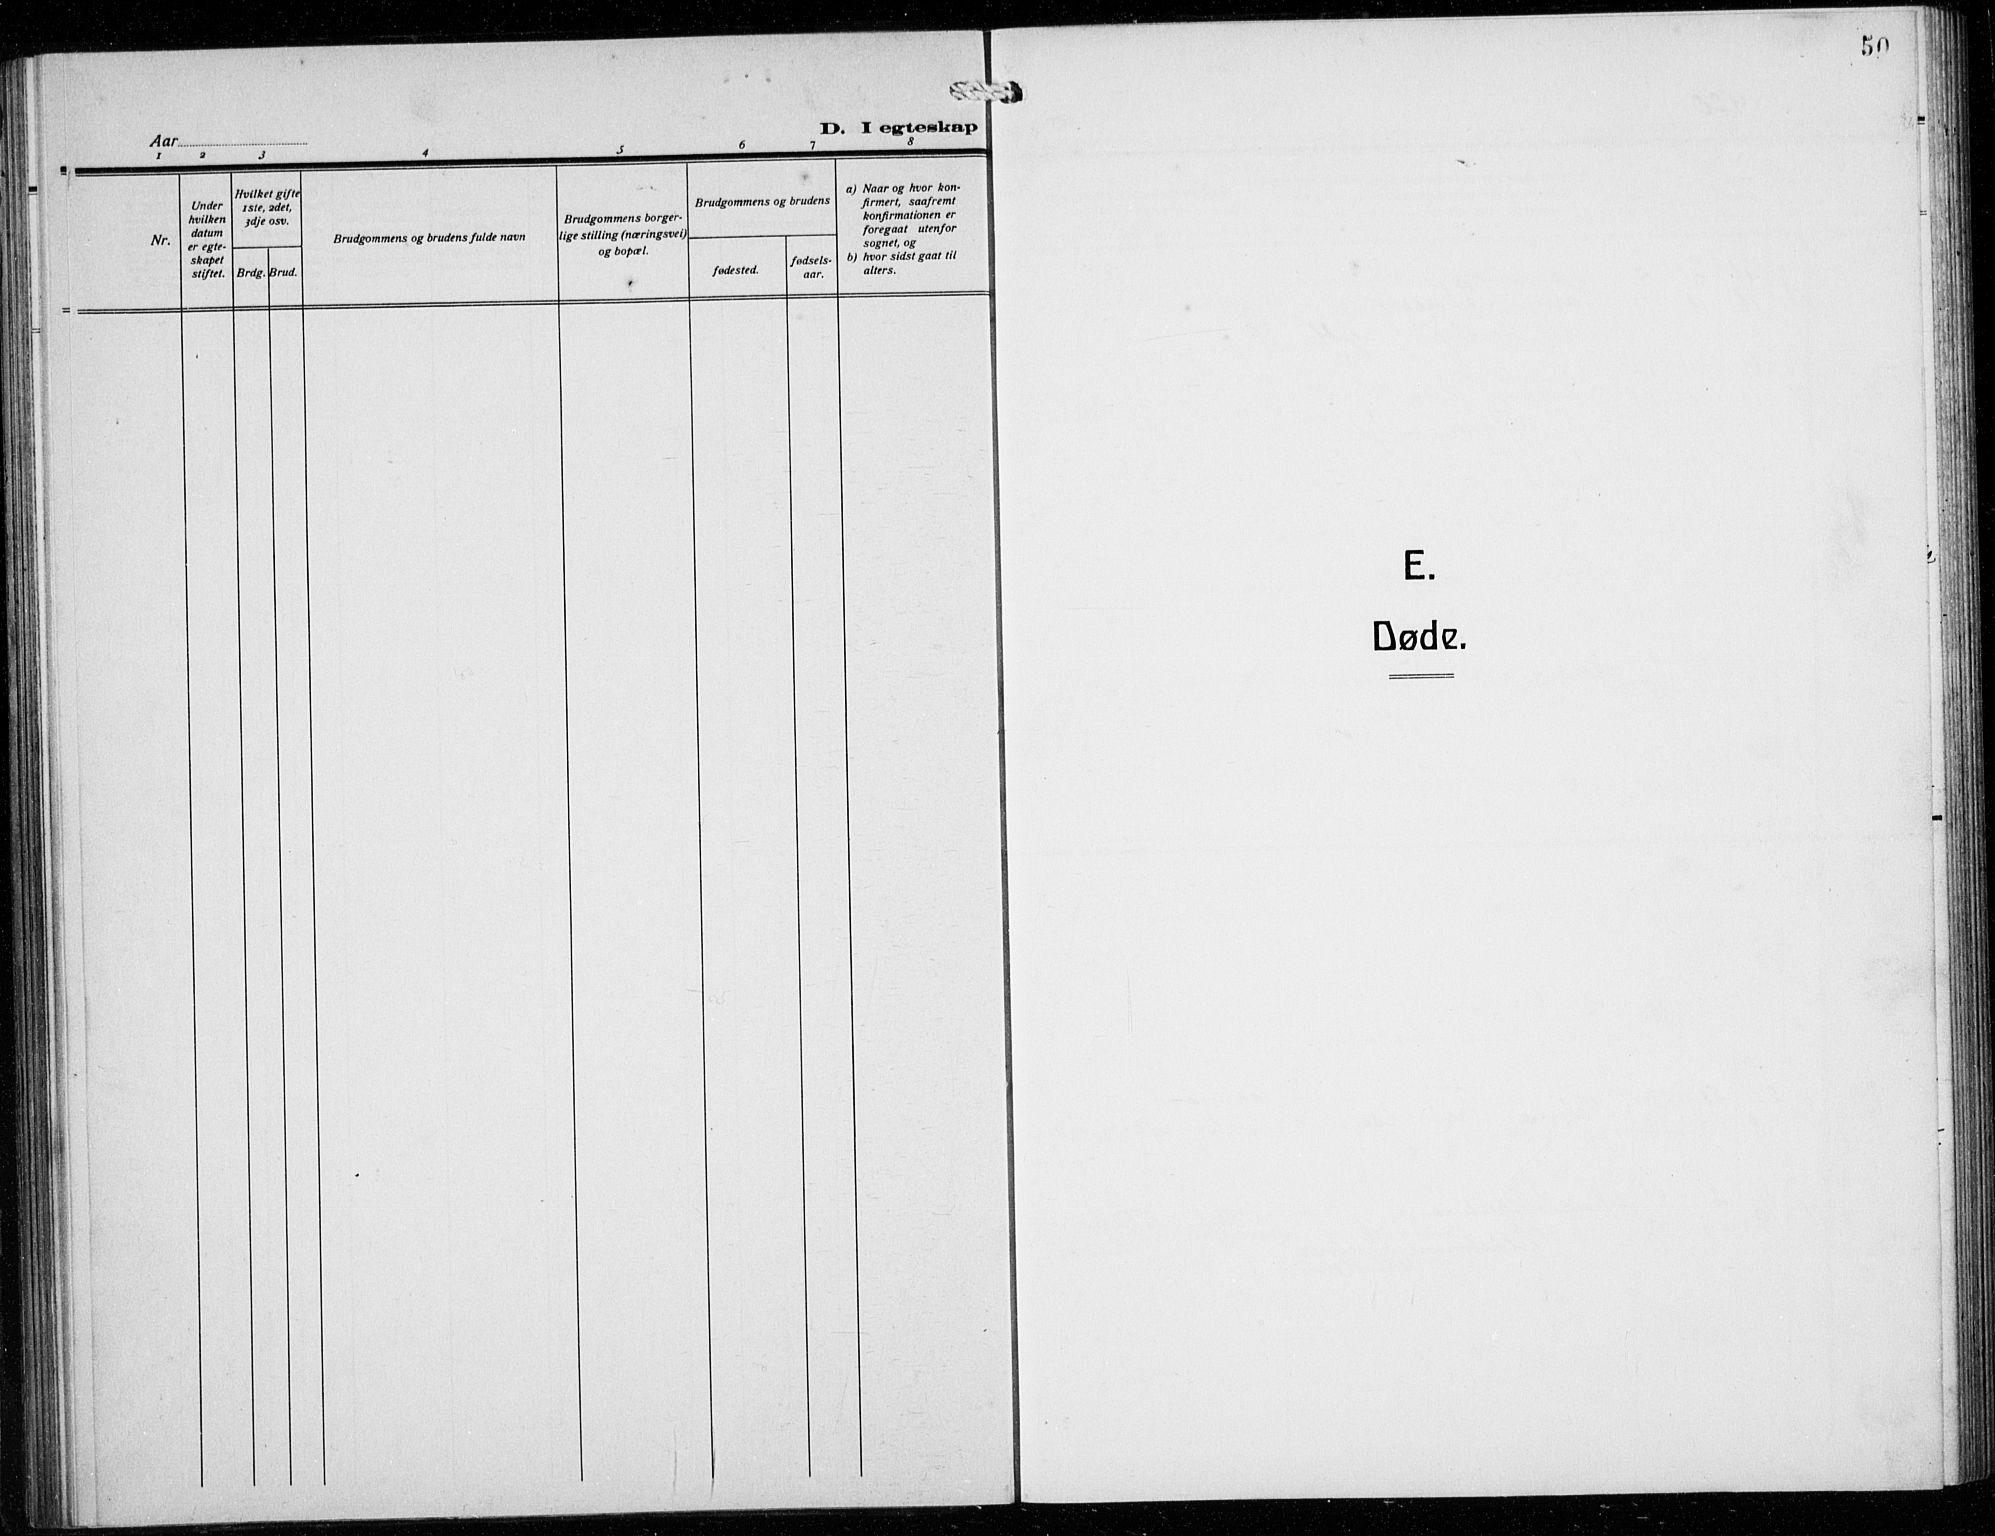 SAB, Den norske sjømannsmisjon i utlandet/Syd-Amerika (Buenos Aires m.fl.), H/Ha/L0003: Parish register (official) no. A 3, 1920-1938, p. 50